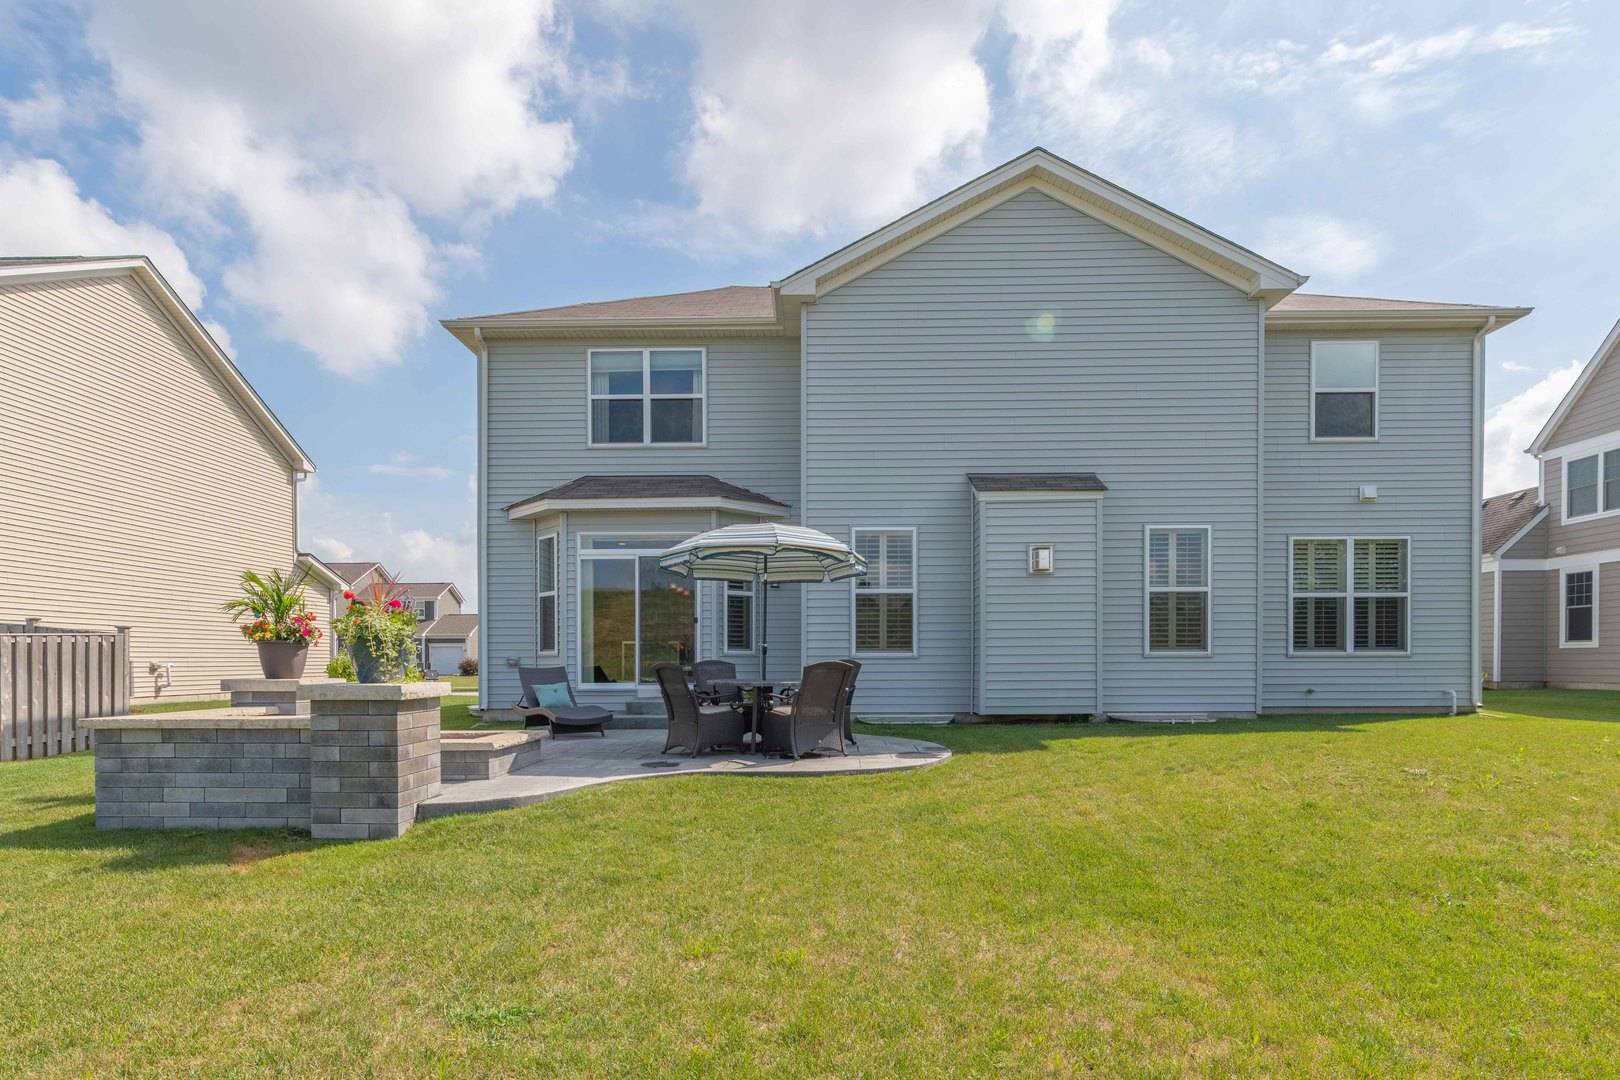 115 Bluegrass, Oswego, Illinois, 60543